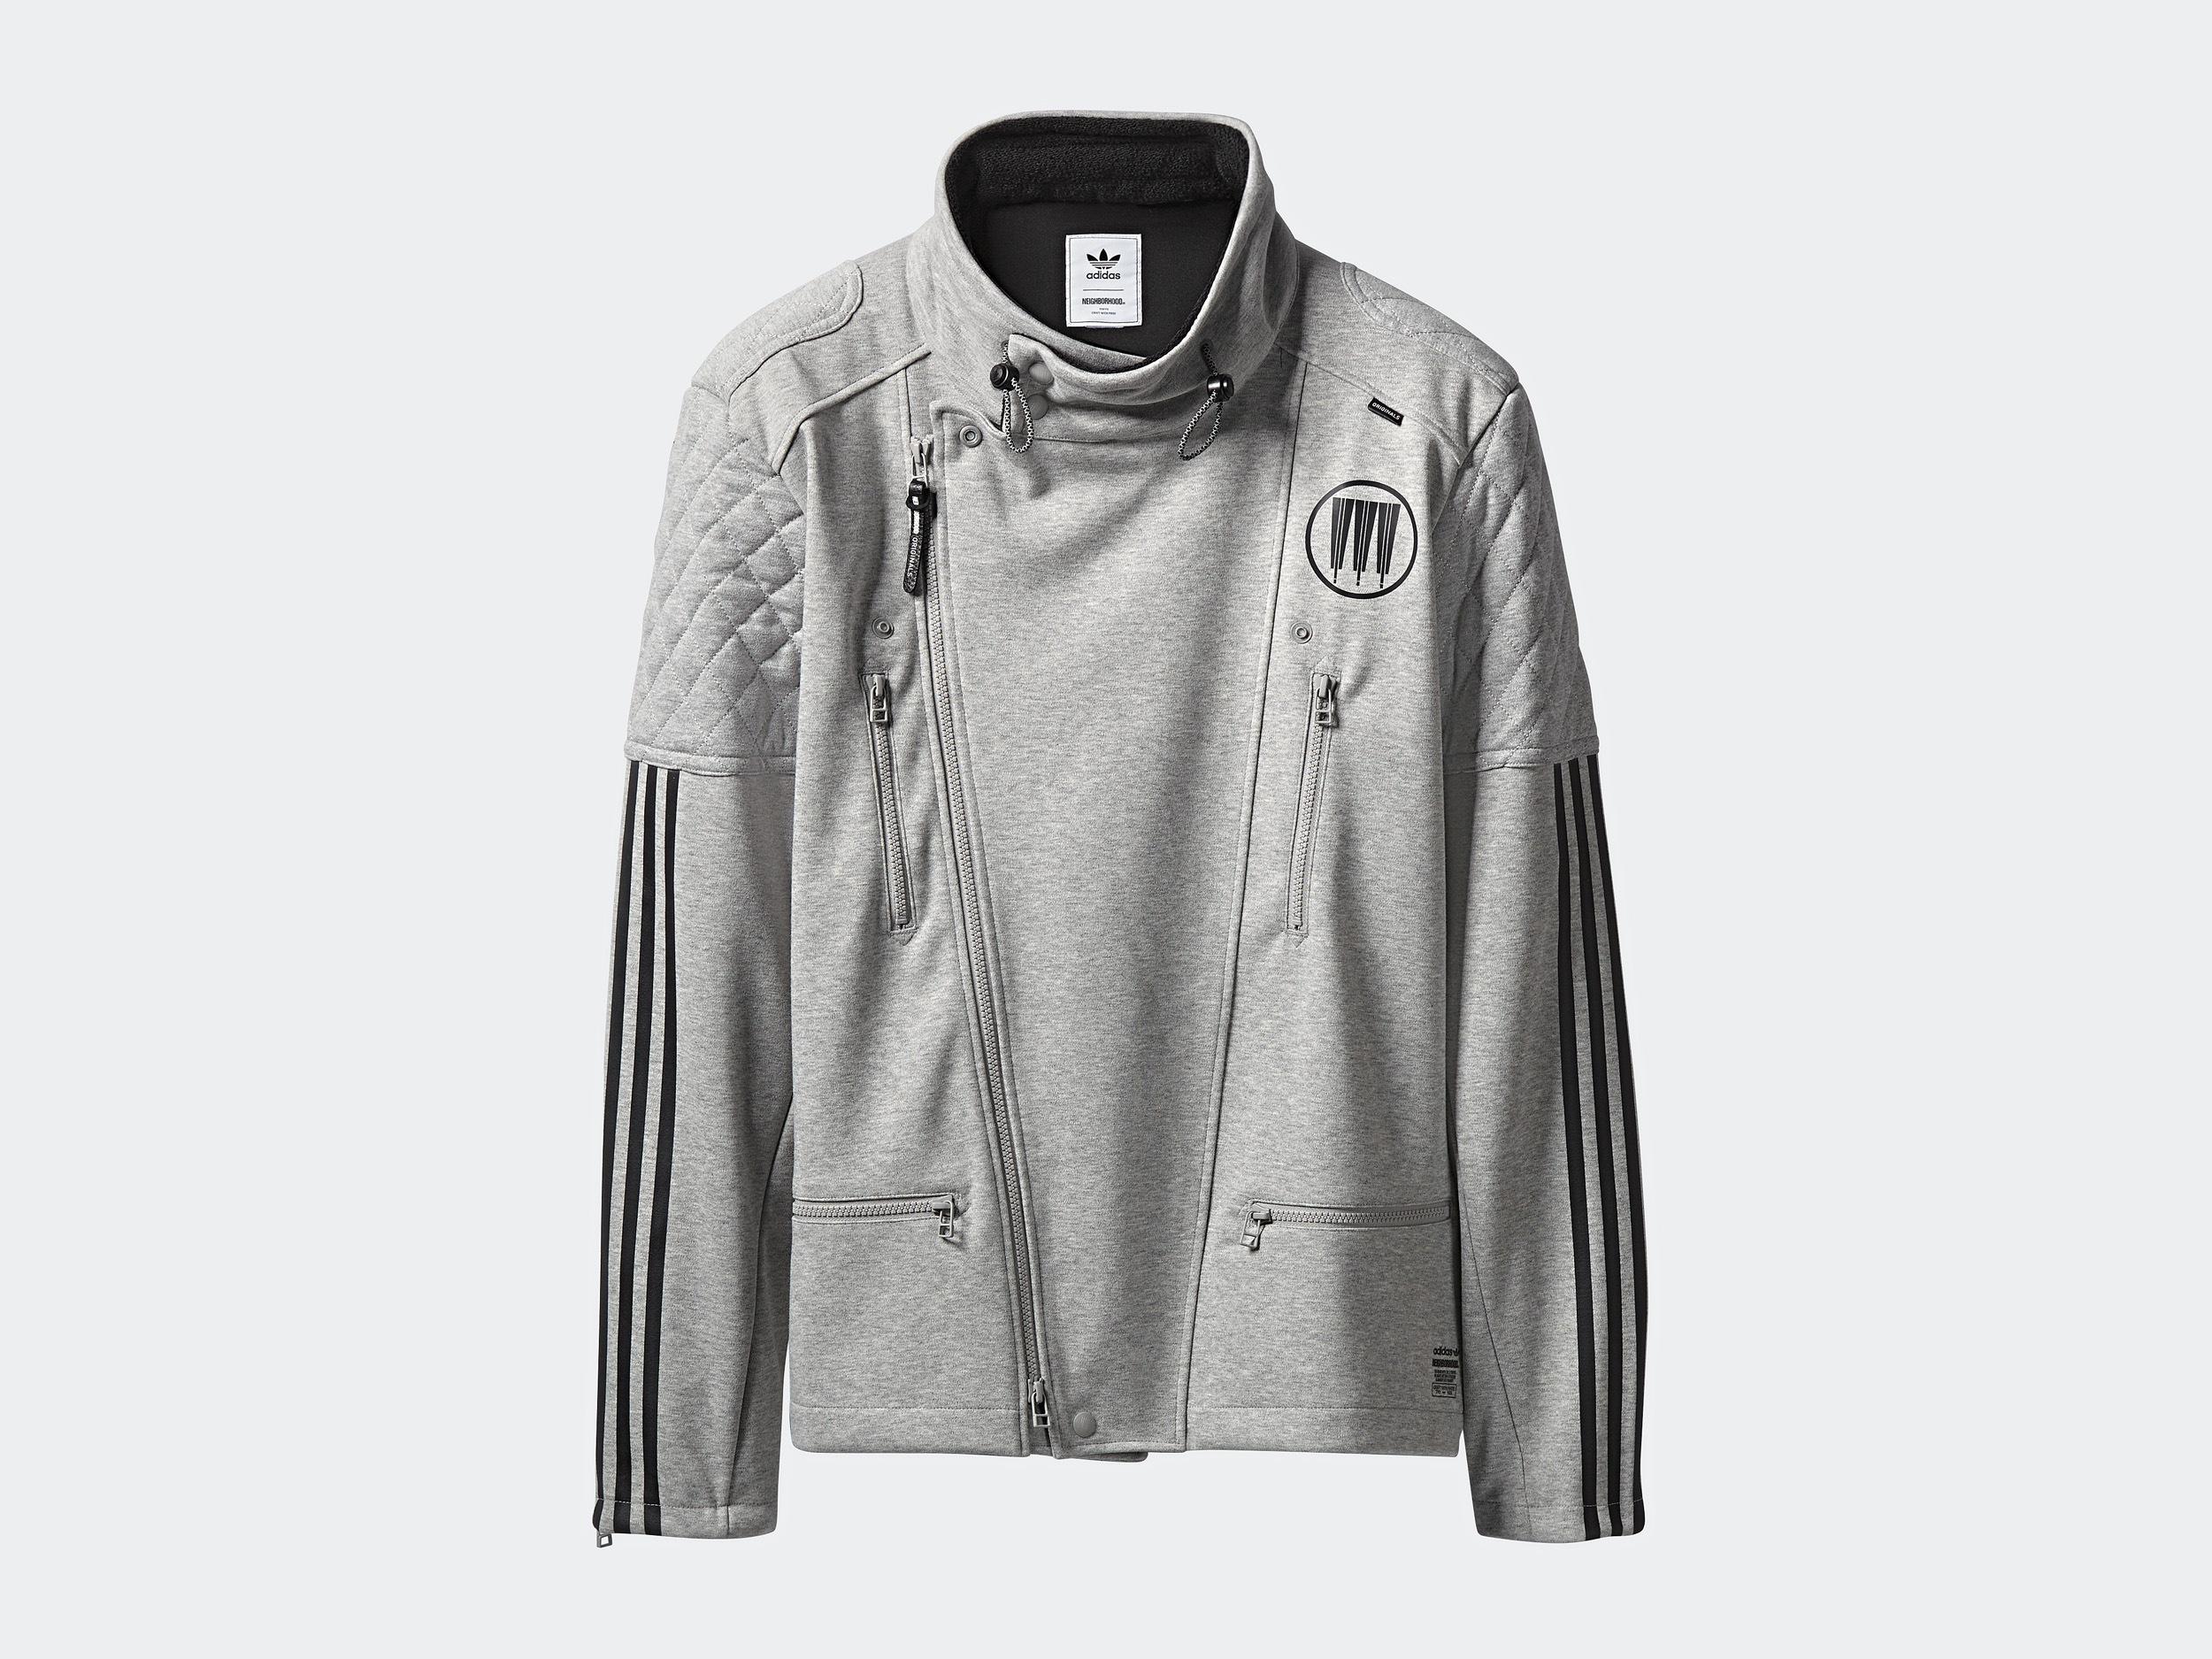 adidas Originals x Neighborhood SpringSummer 2018